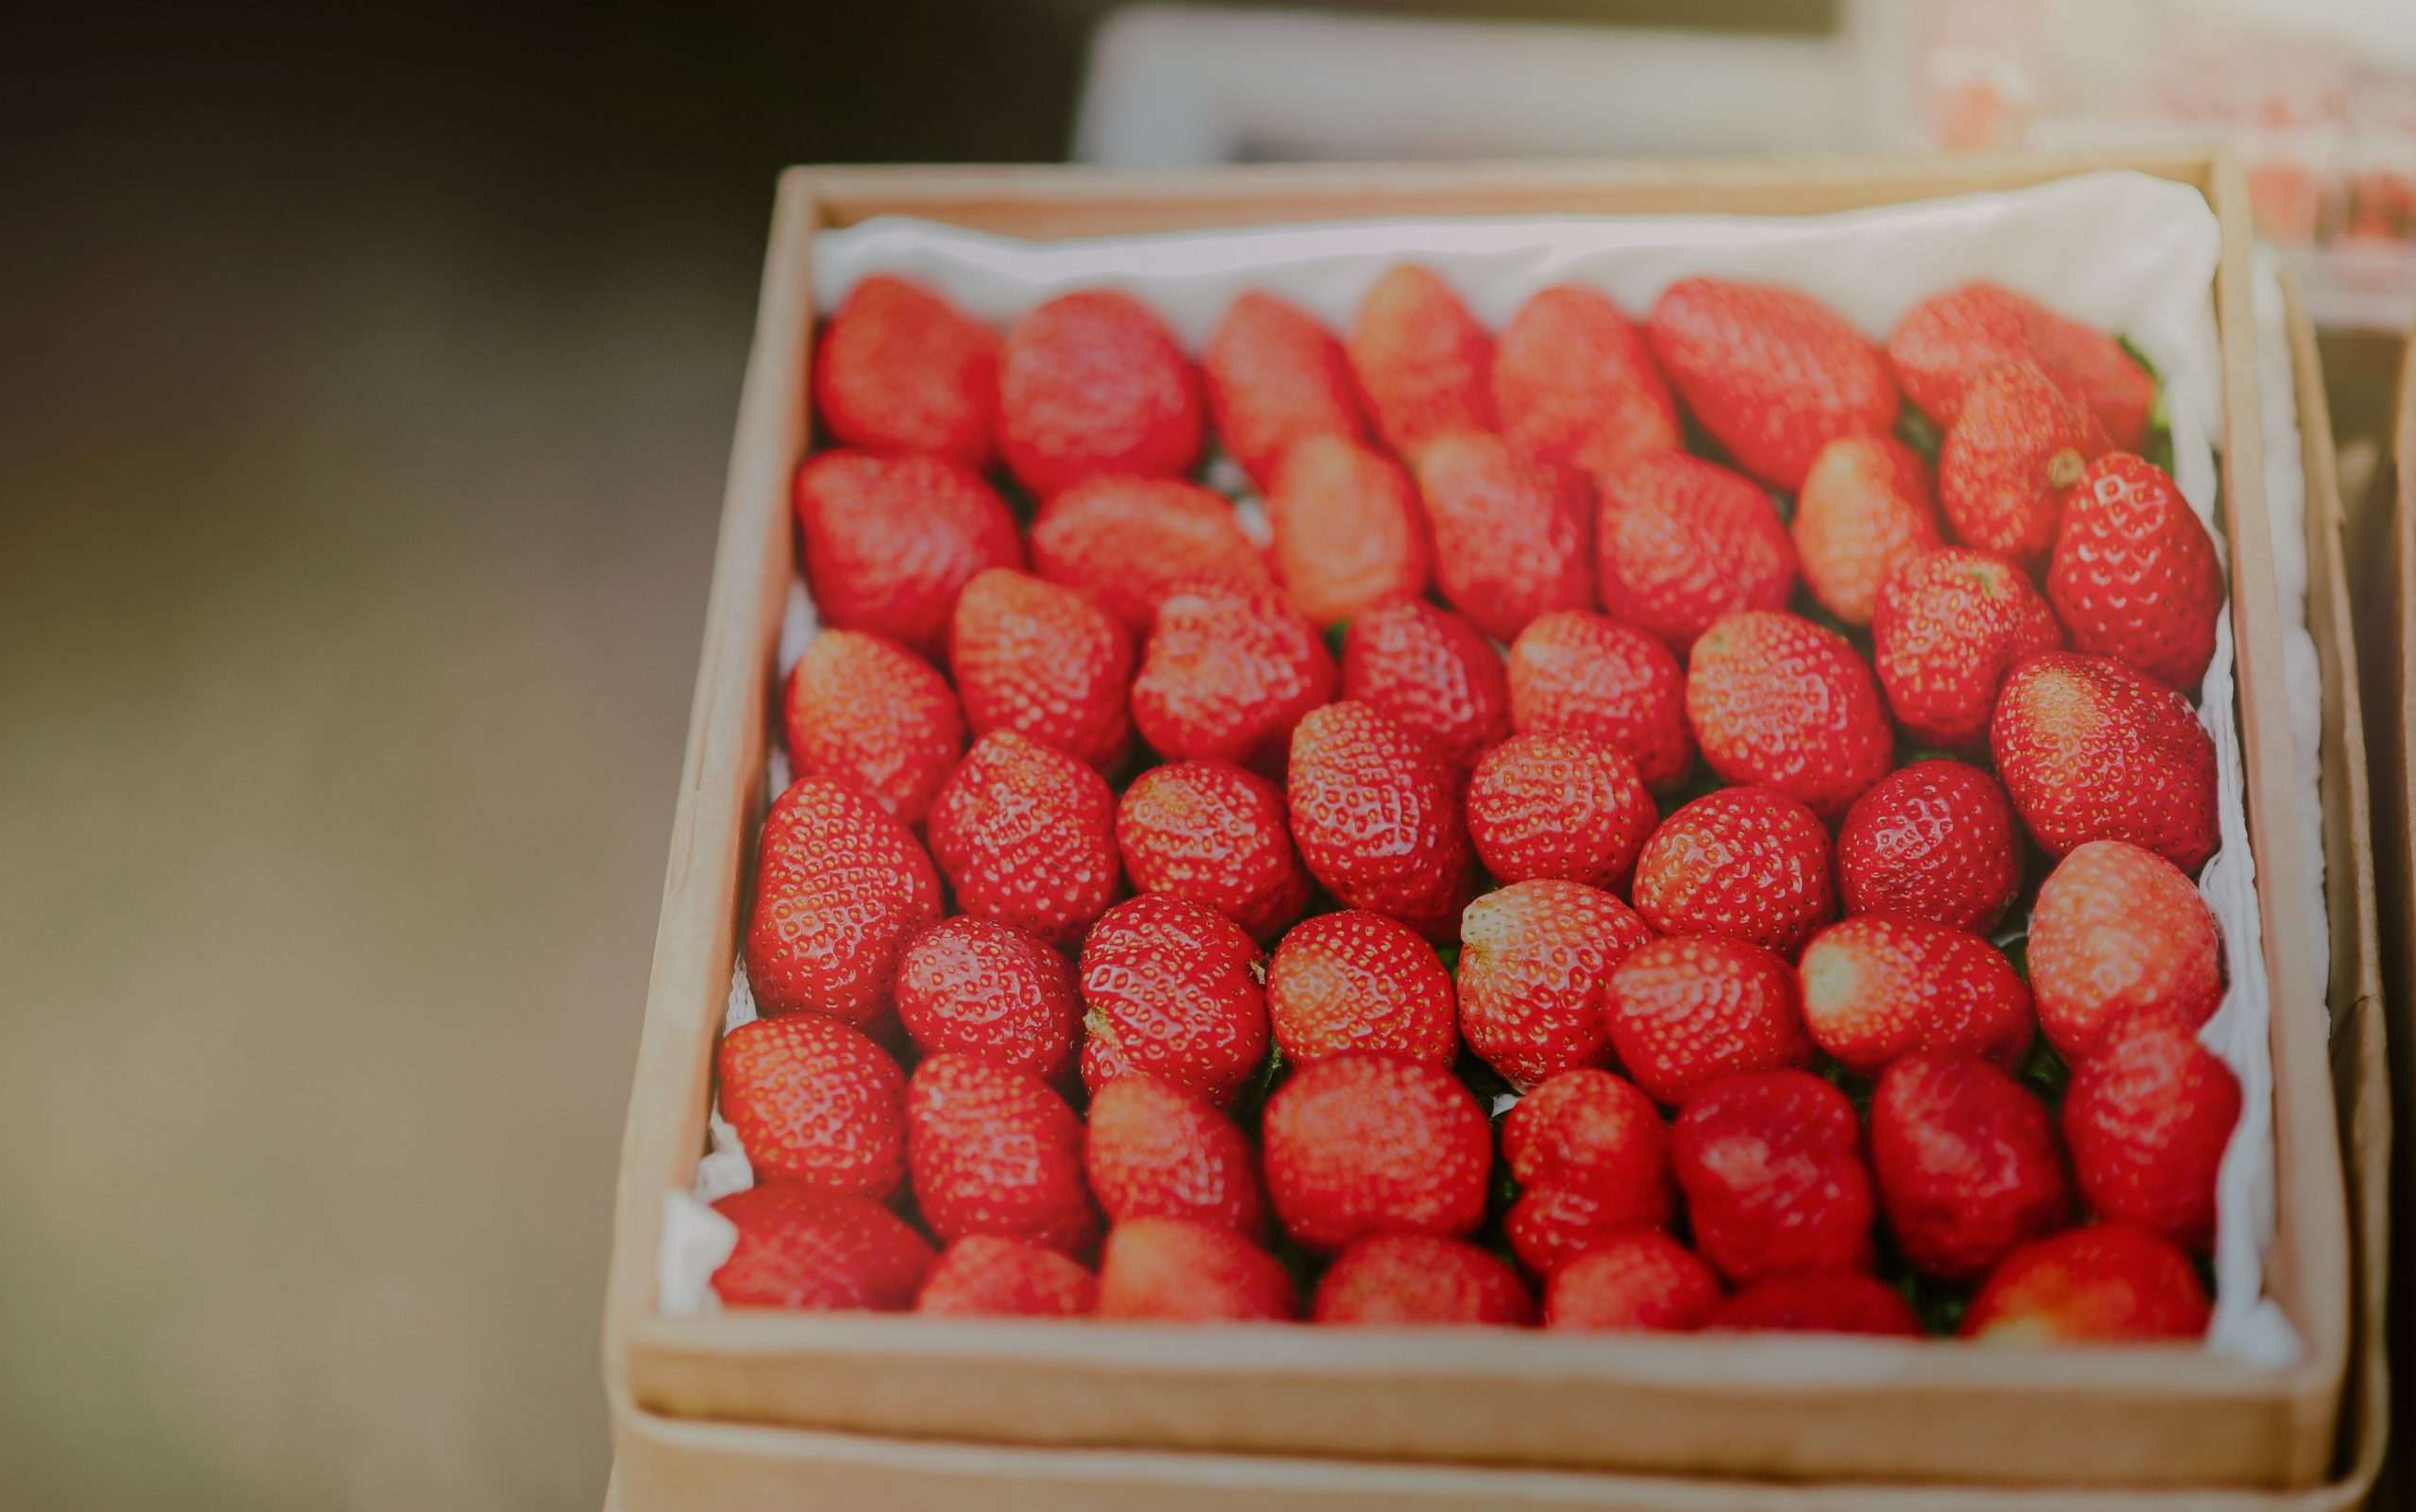 Storing Brad's Strawberries